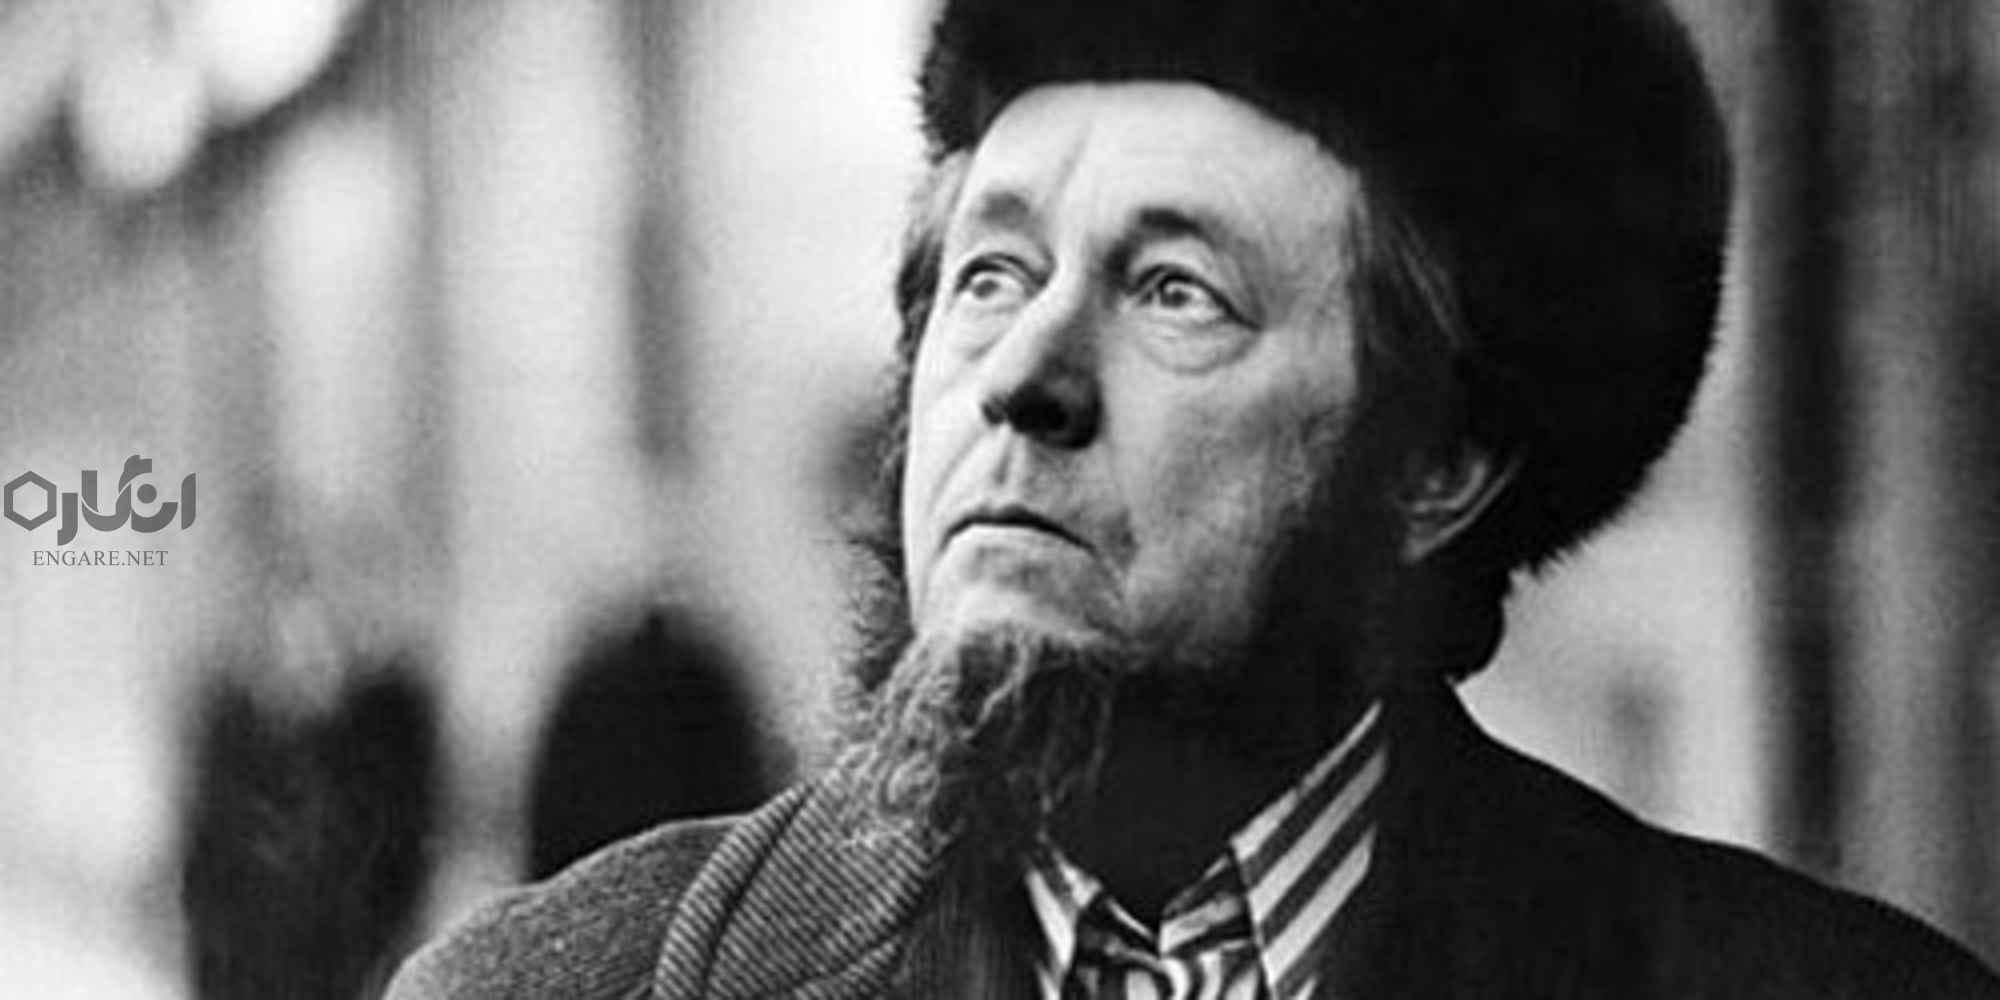 Aleksandr Solzhenitsyn - نویسندهای در دوزخ ایدئولوژی - هیتلر, مهدی تدینی, کمونیسم, کمونیست, فاشیسم, شوروی, سولژنیتسین, خروشچوف, الکساندر سولژِنیتسین, استالین, Aleksandr Solzhenitsyn